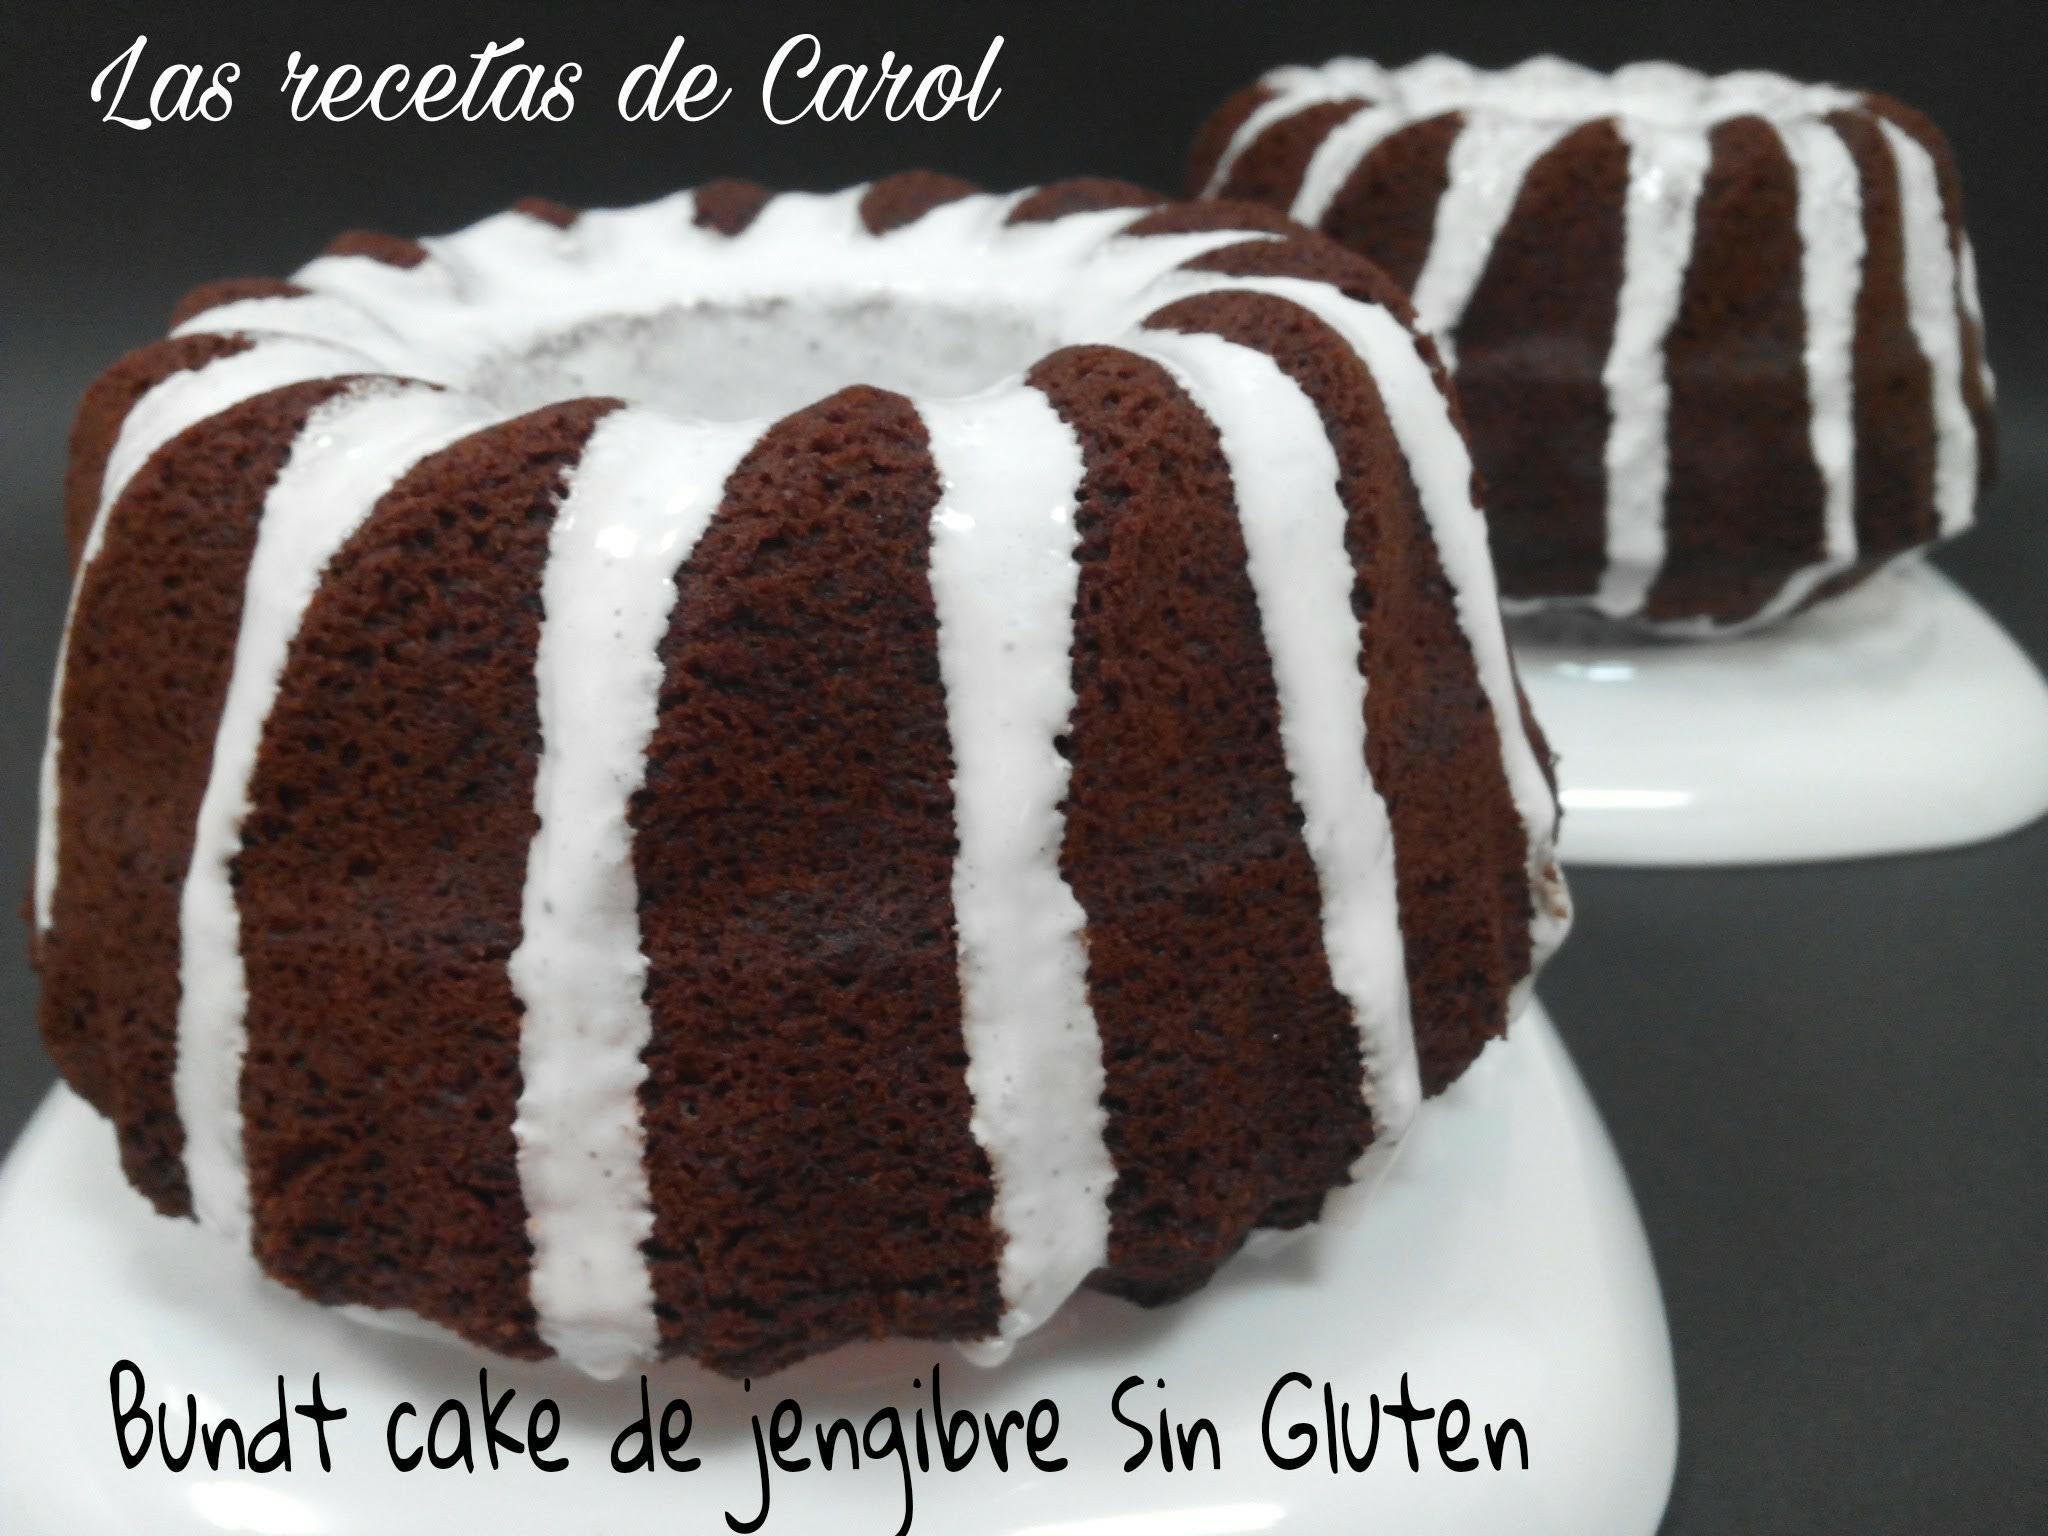 Bundt Cake de Jengibre